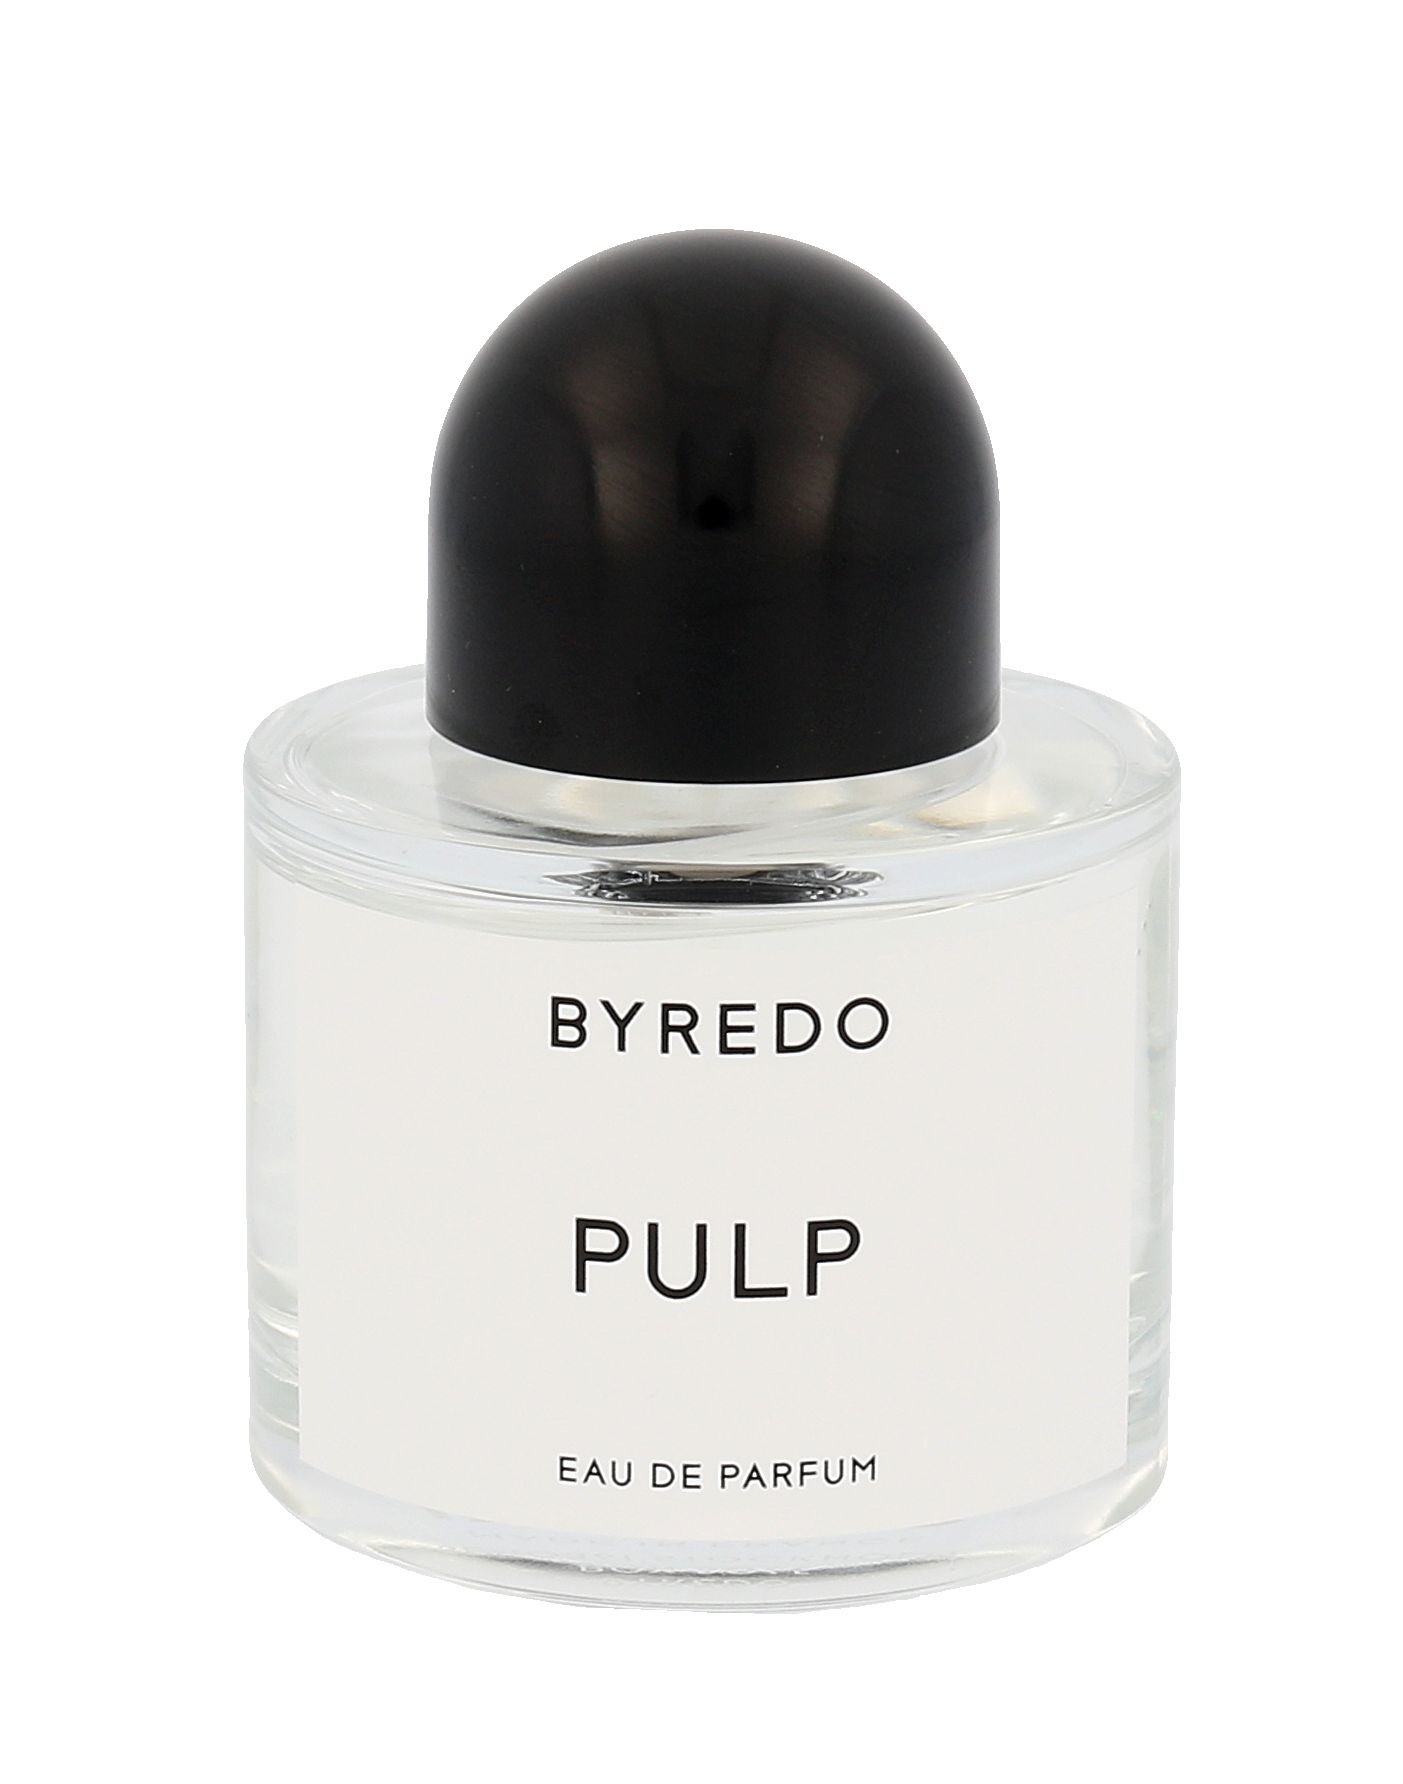 BYREDO Pulp EDP 50ml